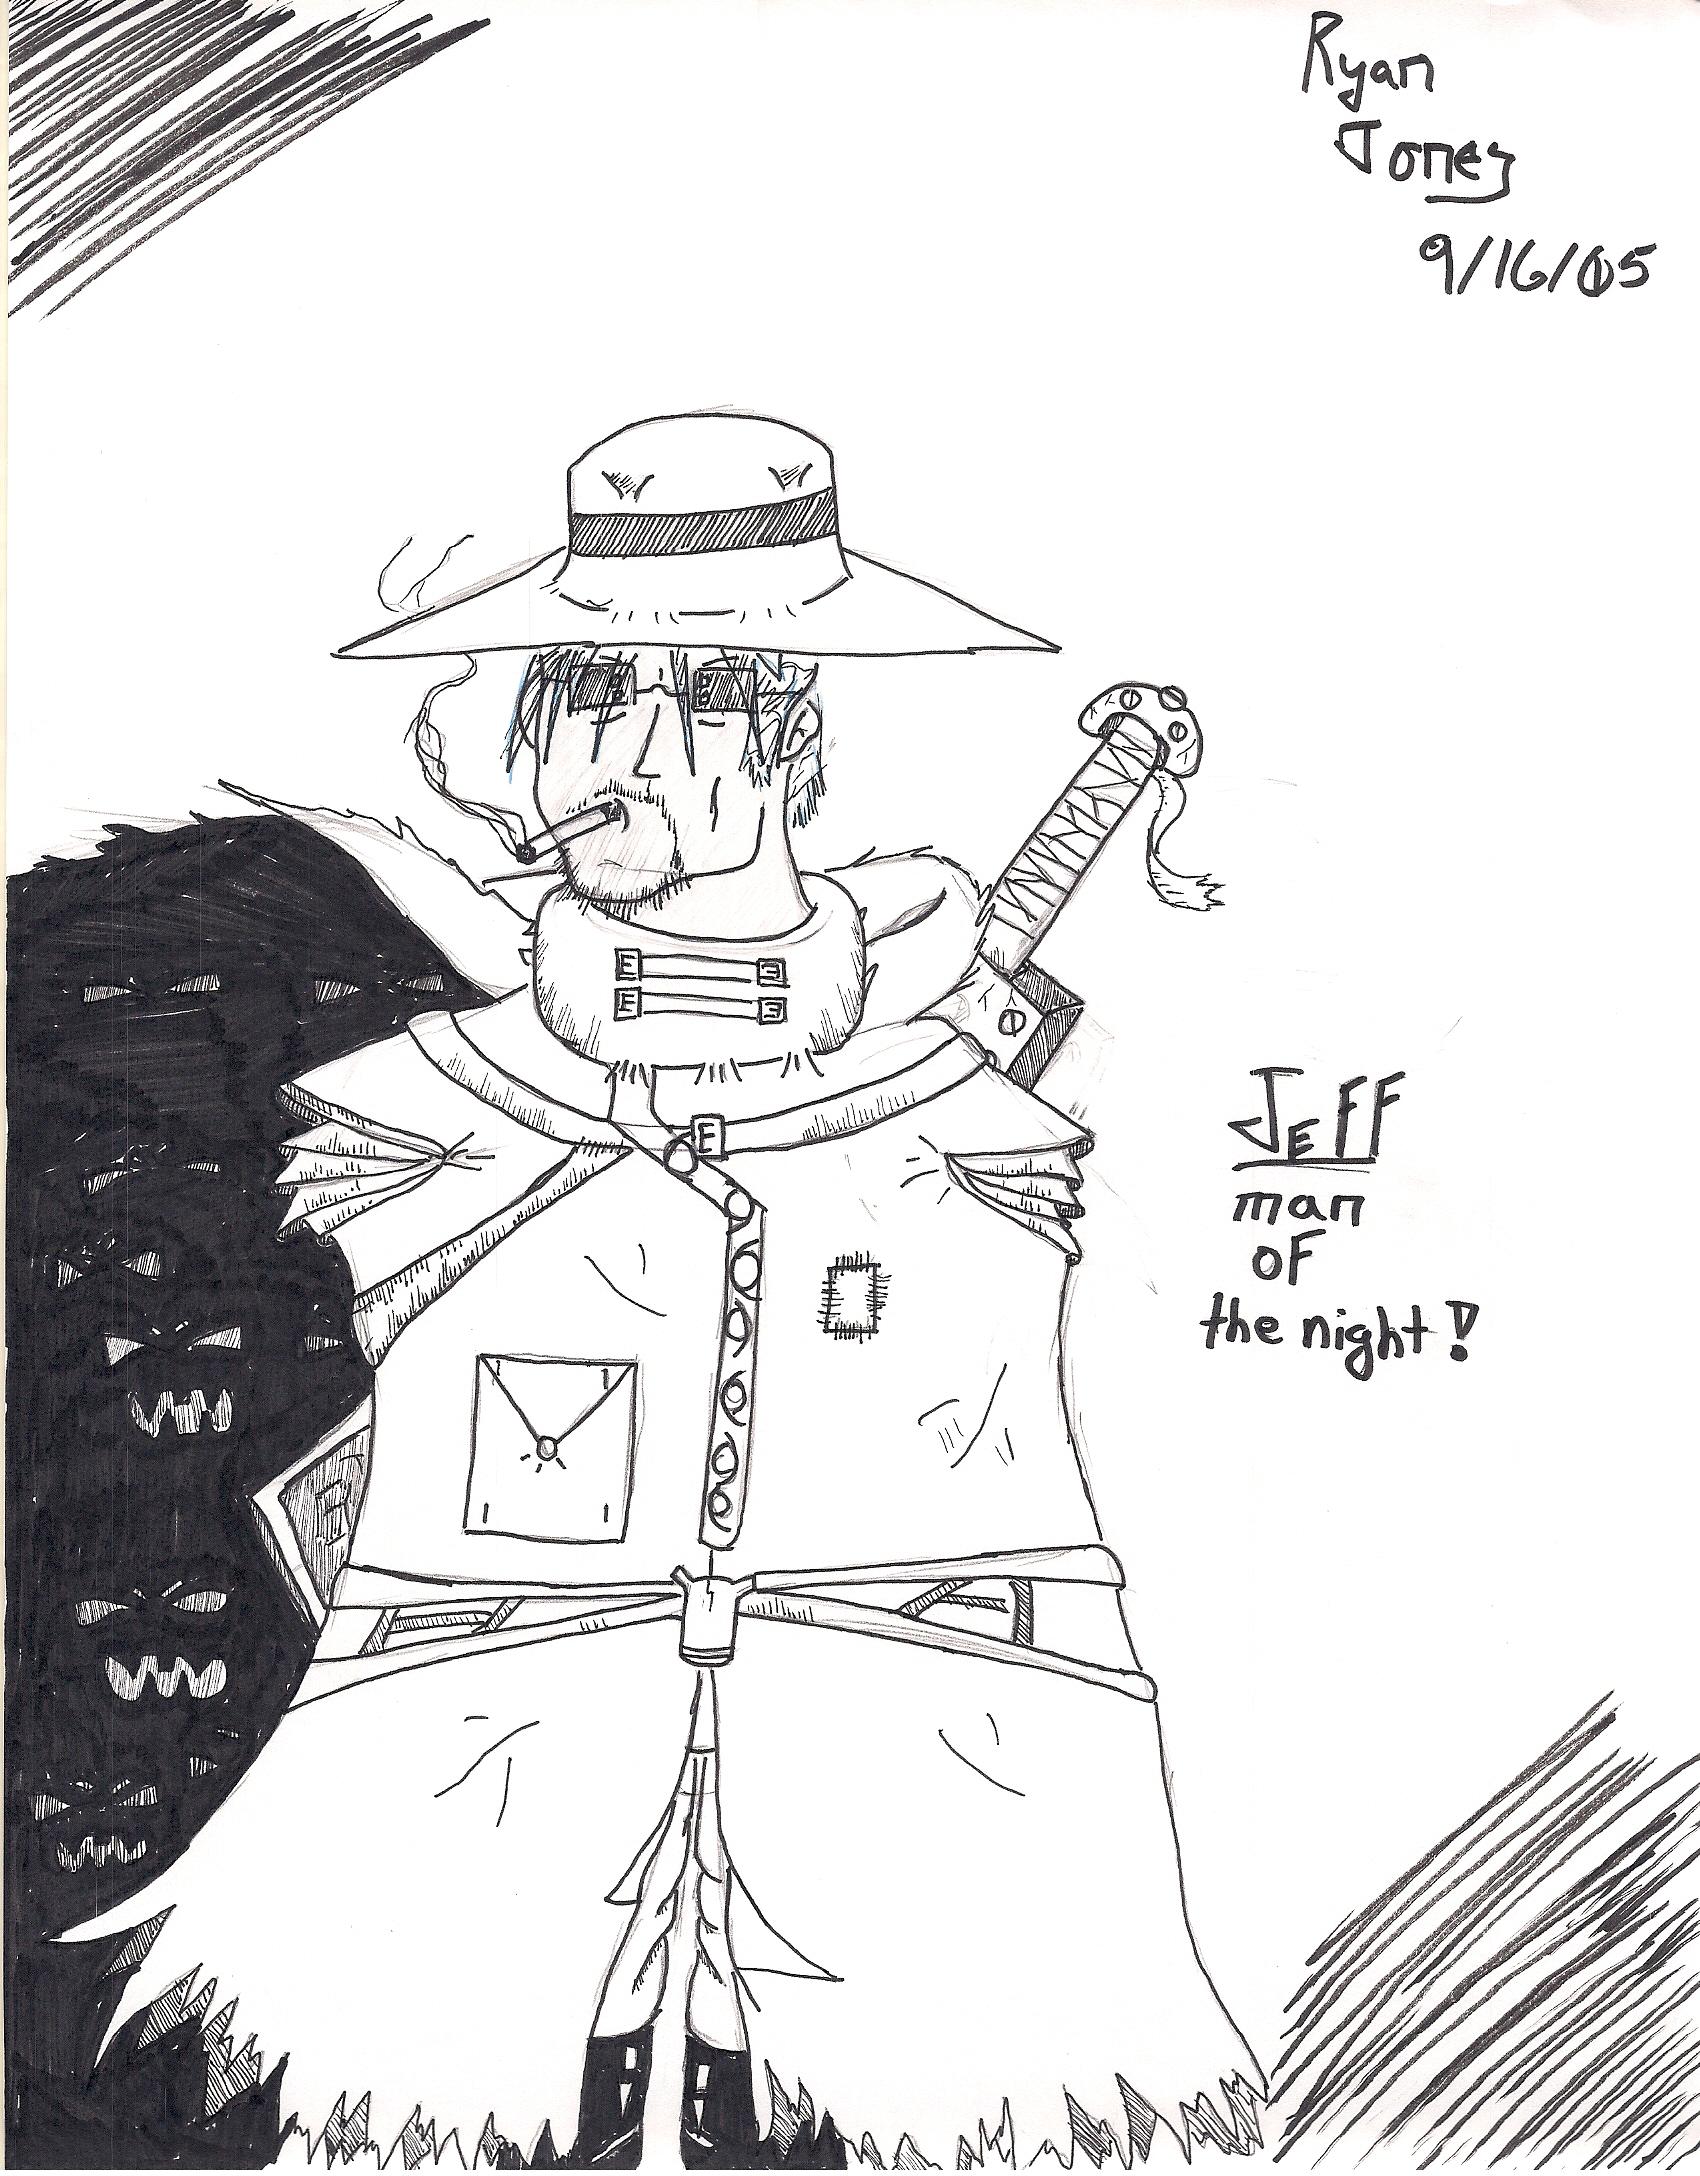 Jeff man of the night by Sturm75